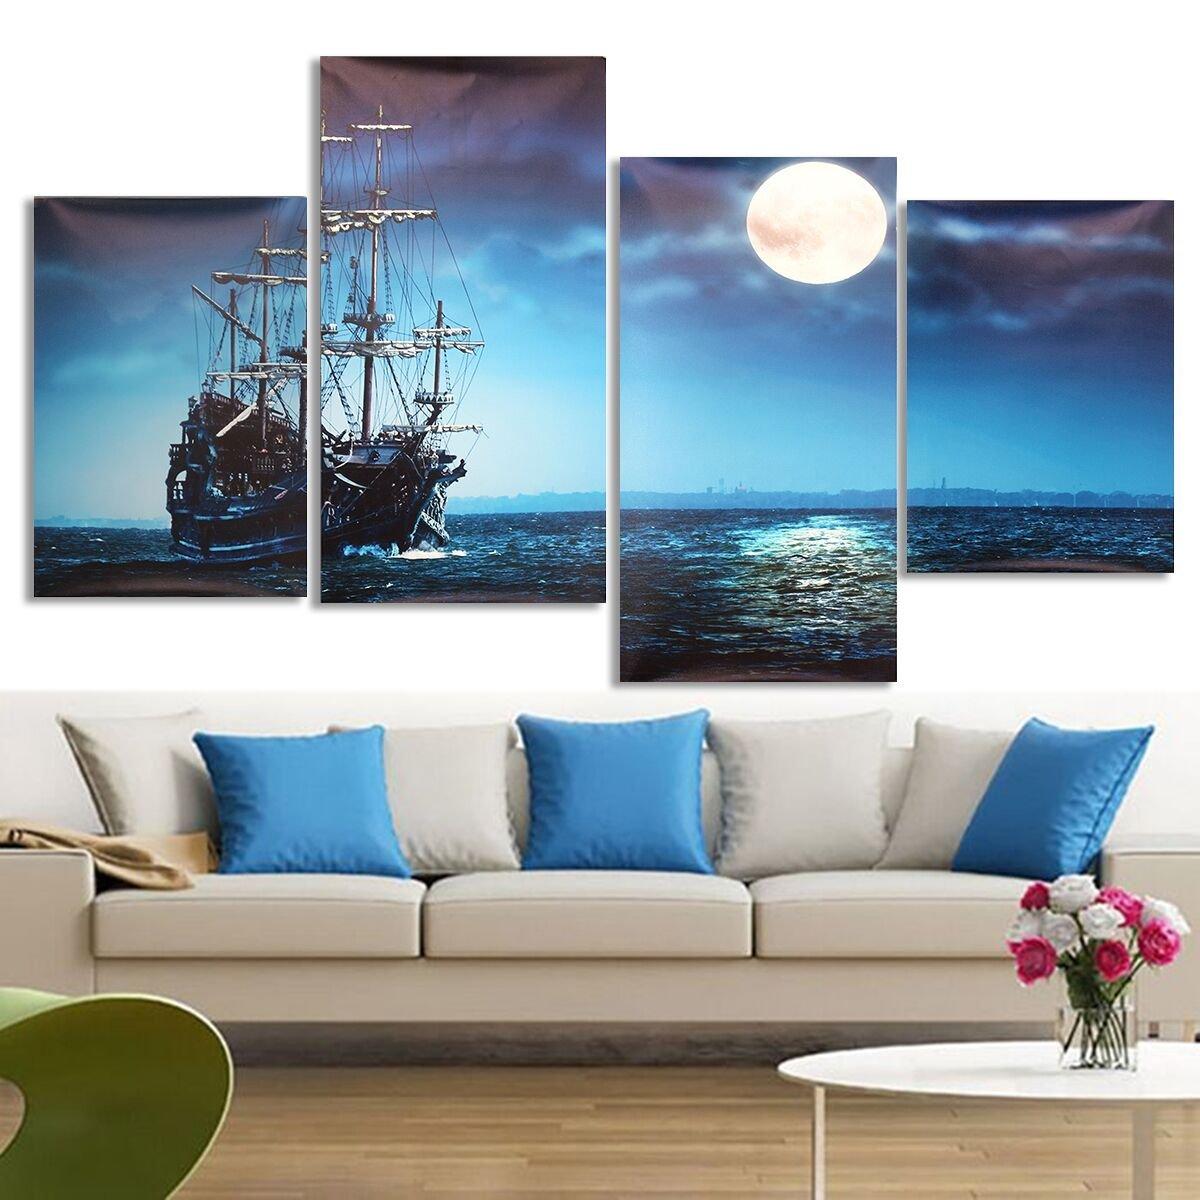 4Pcs Blue Sea Boat Canvas Painting Unframed Wall Art Bedroom Living Room Home Decor